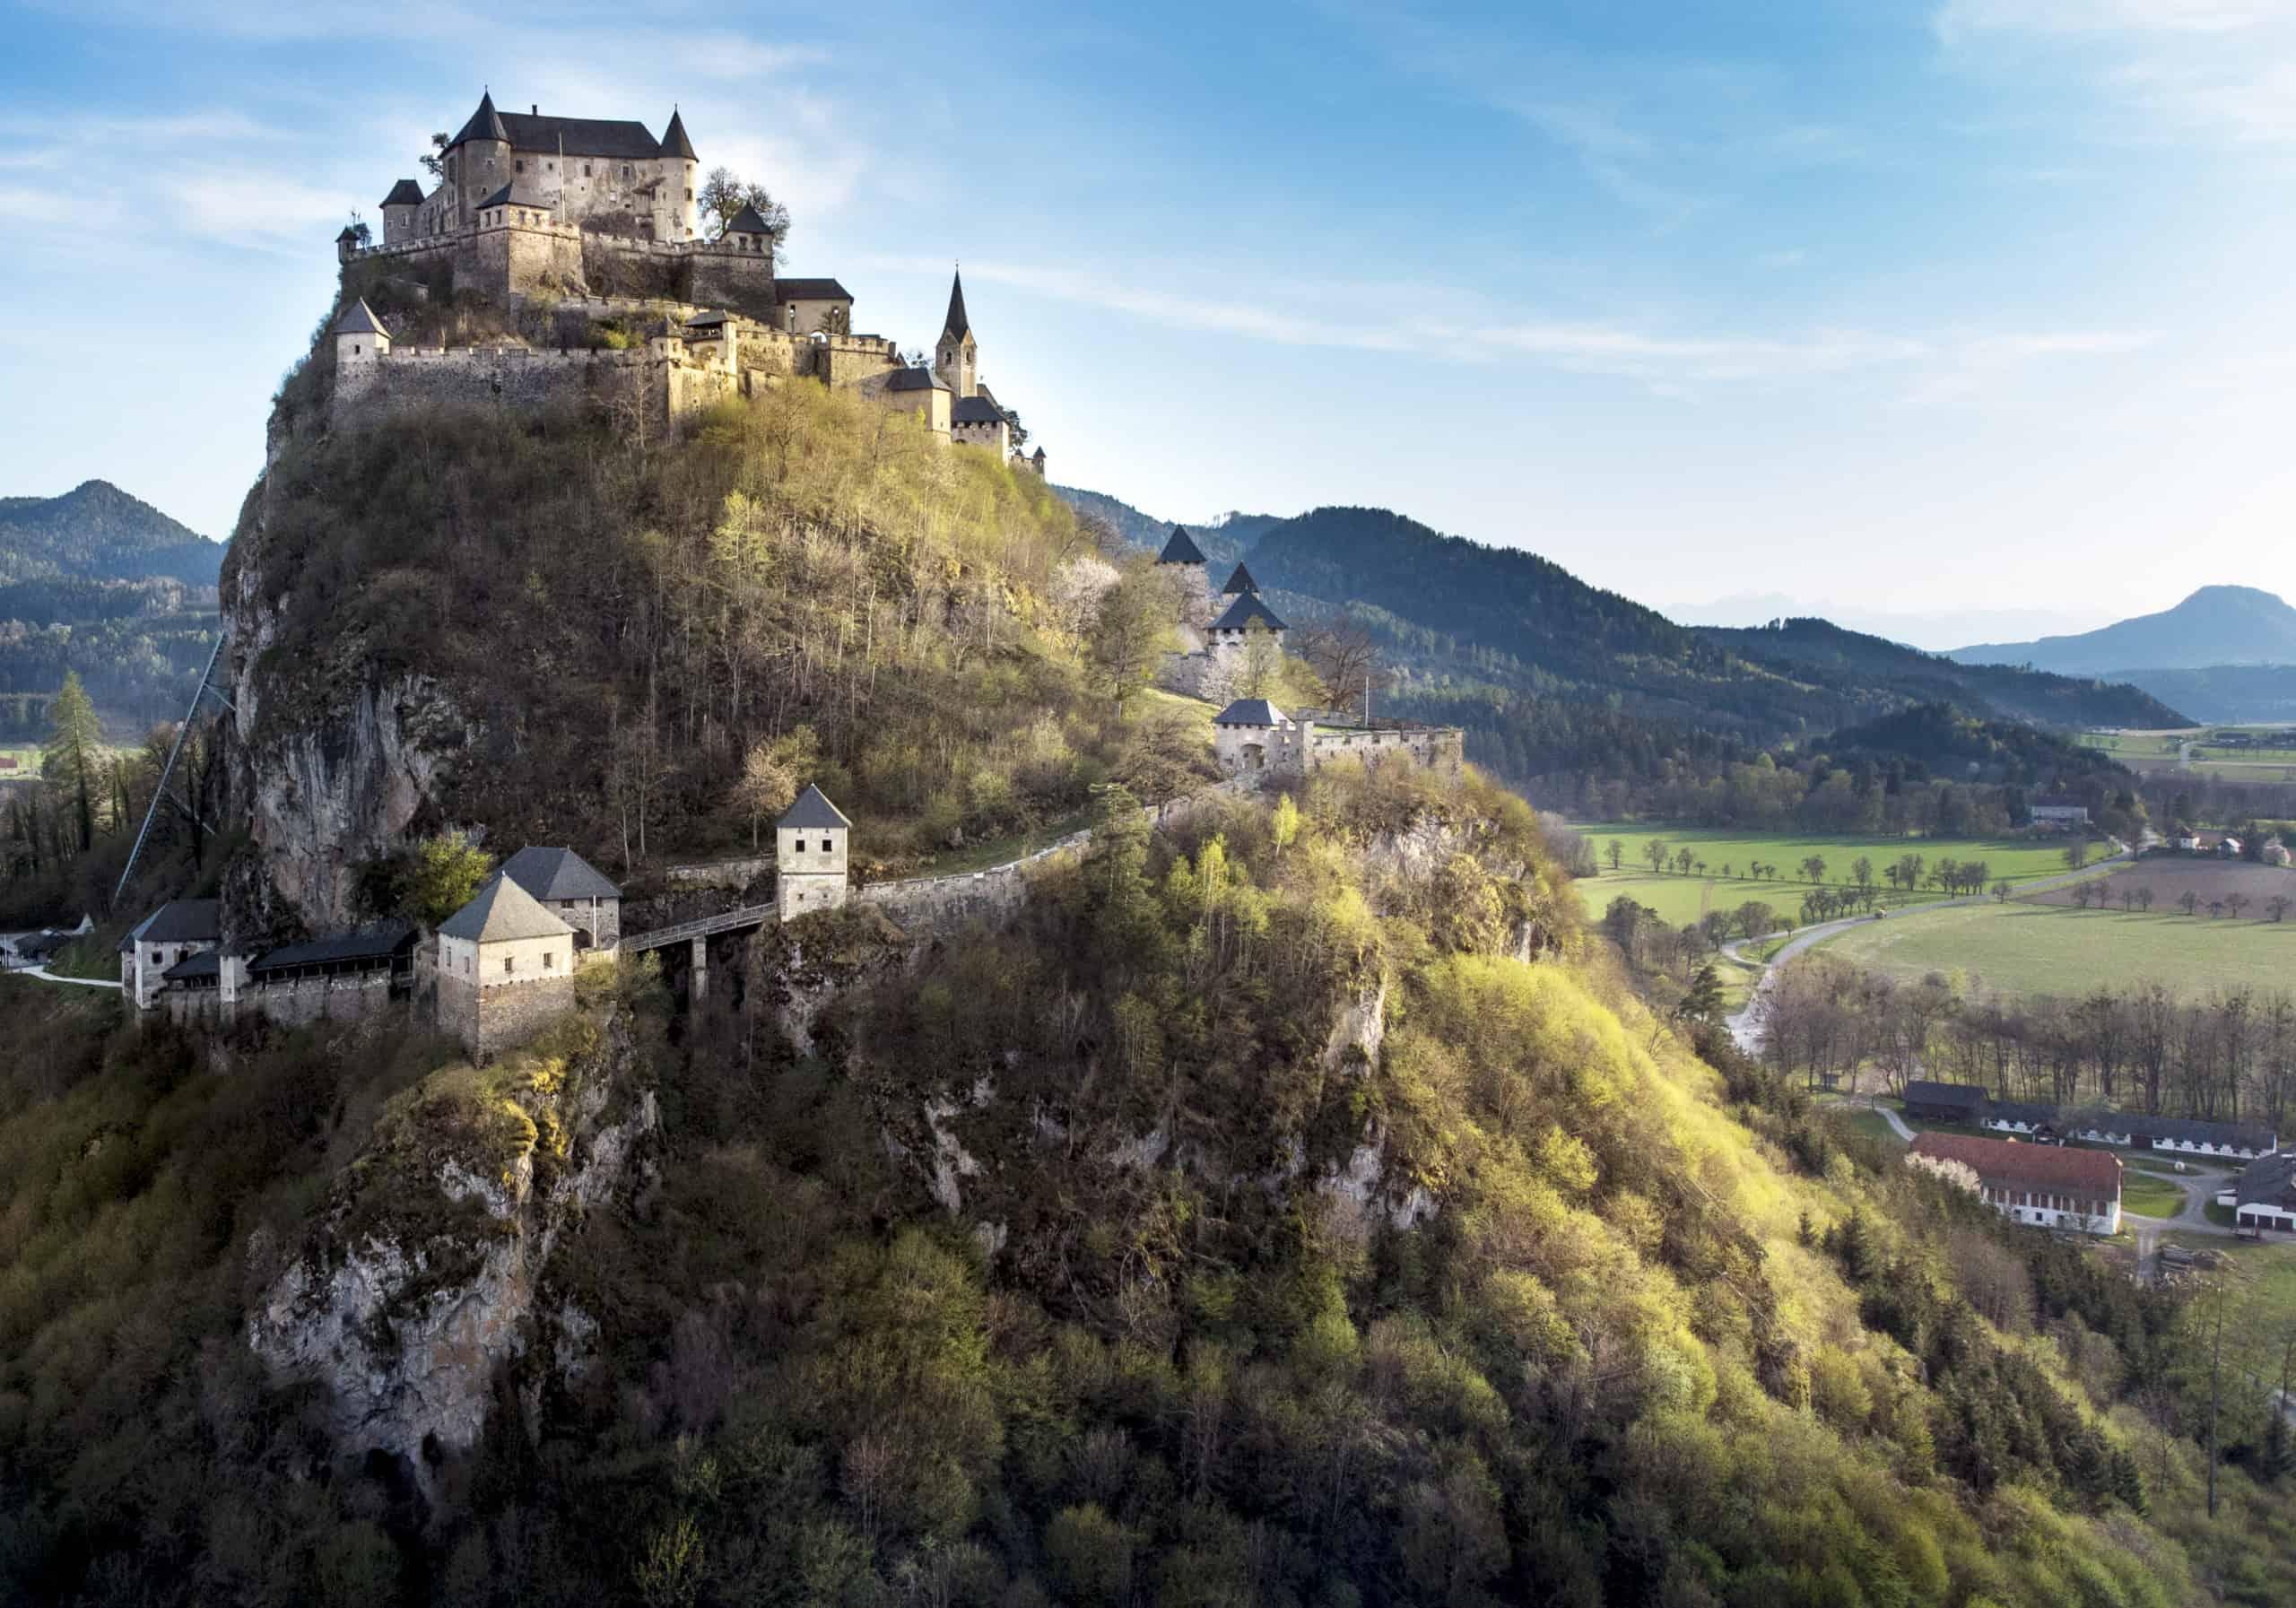 Burg Hochosterwitz Nähe Längsee in Kärnten